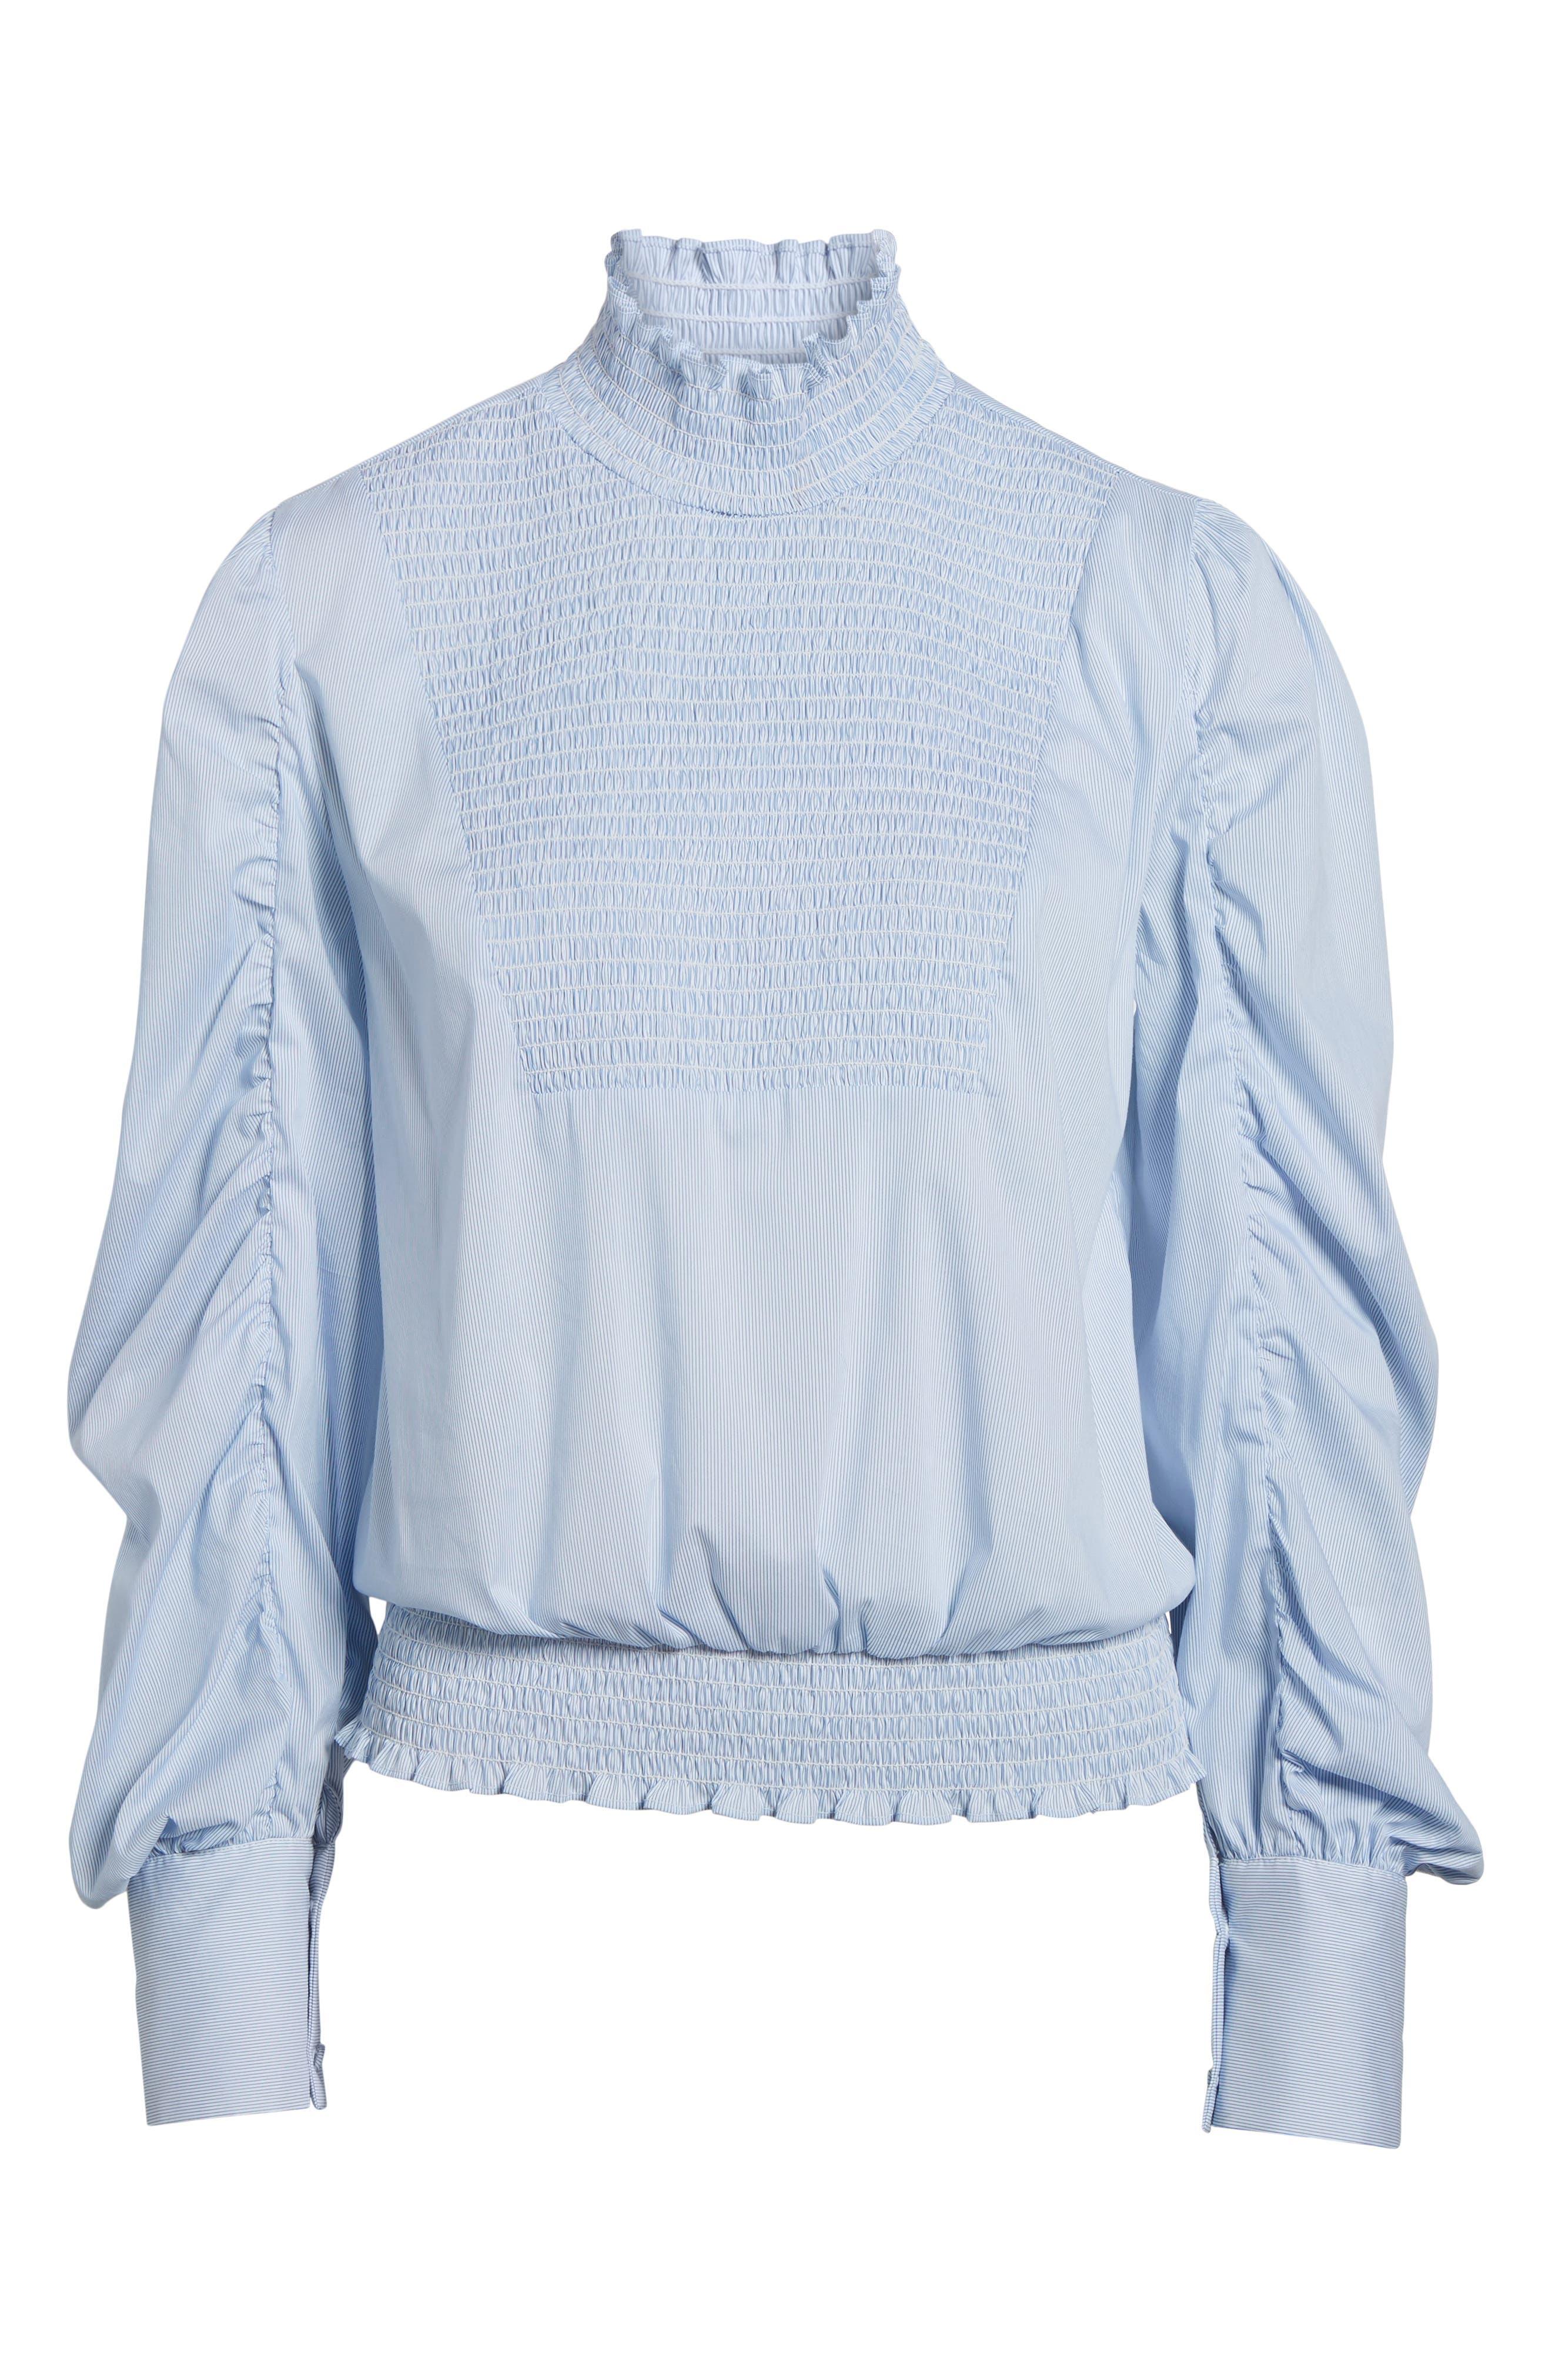 Smocked Puff Sleeve Poplin Top,                             Alternate thumbnail 6, color,                             Blue- White Pinstripe